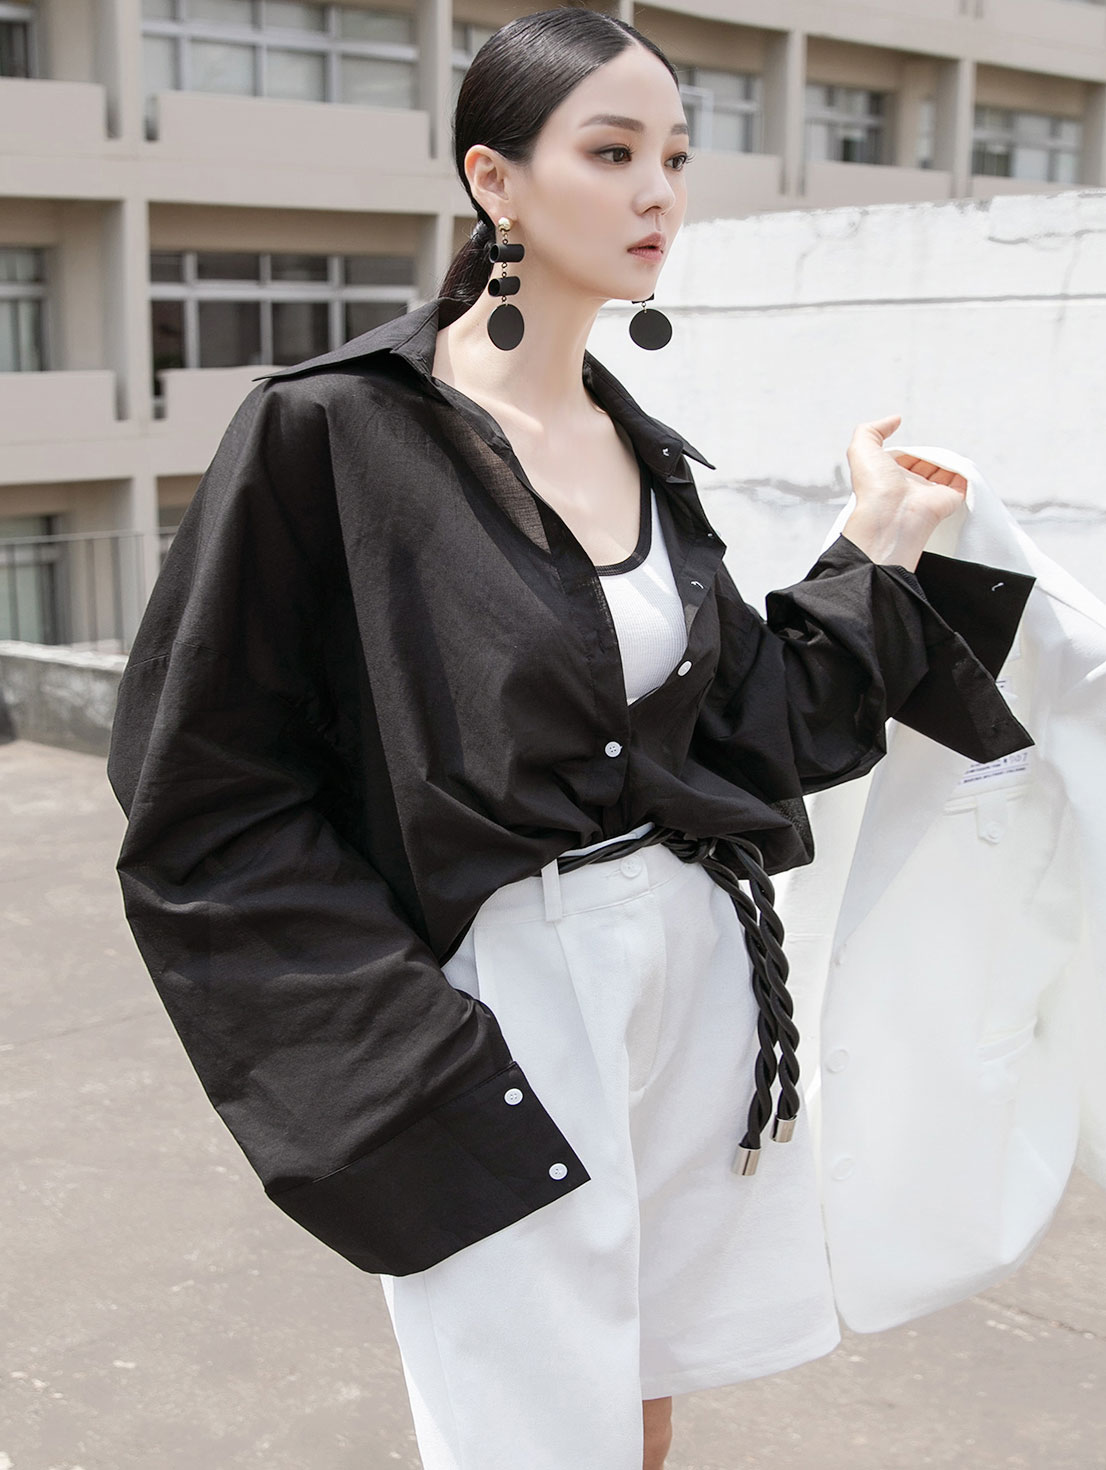 S379 シースルーオーバーフィットシャツ韓国